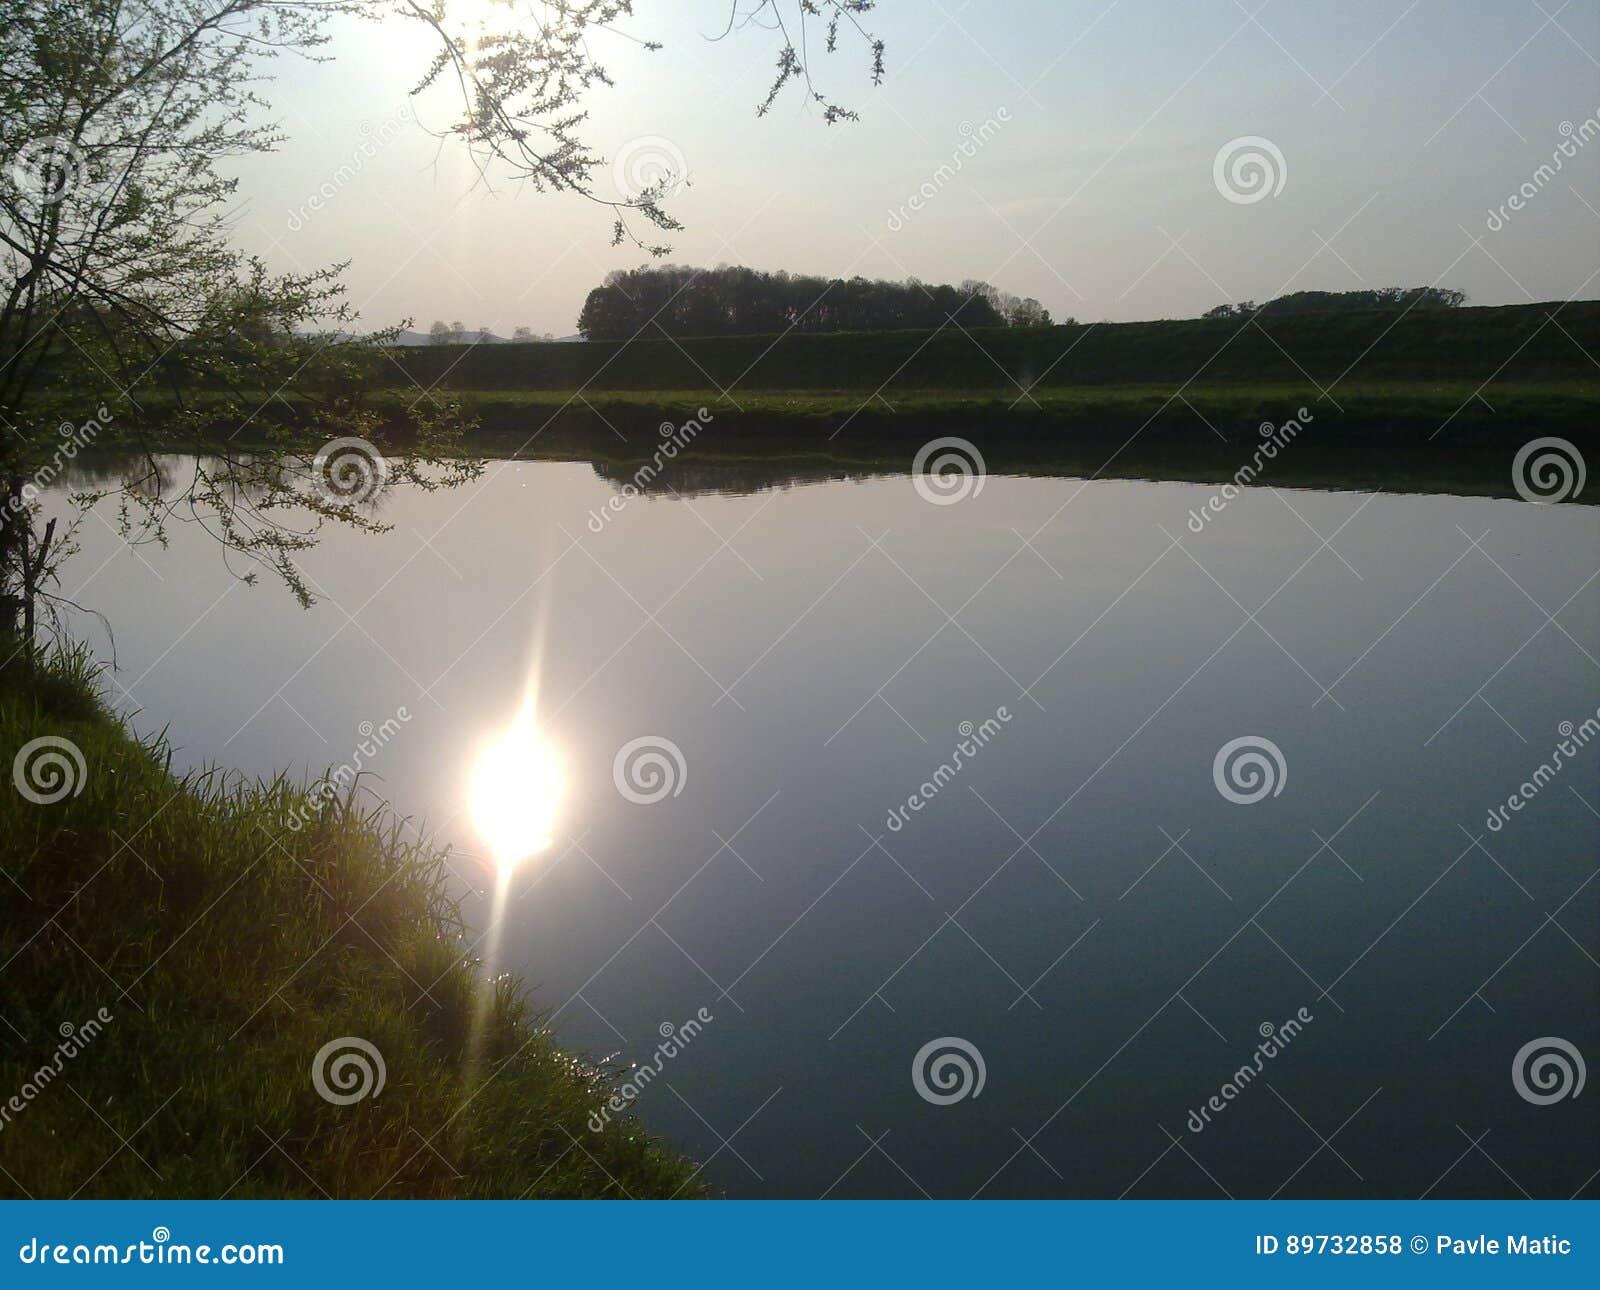 Natur vatten flod, kust, solnedgång, kolubara